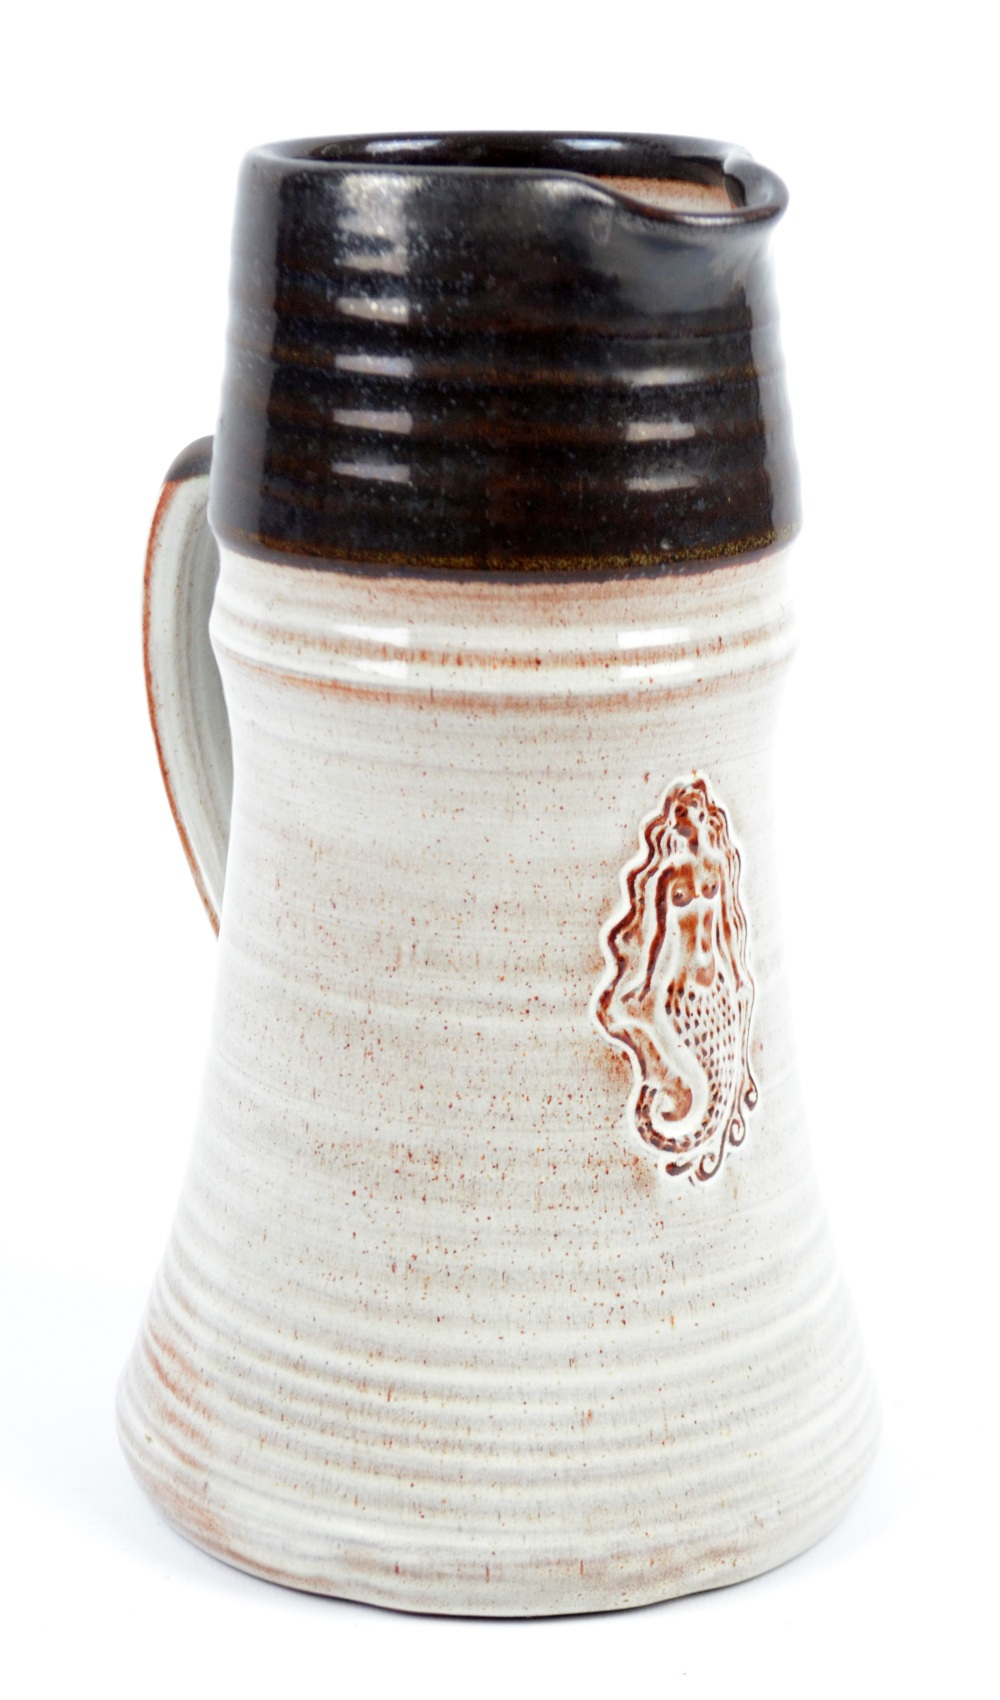 Lot 135 - HARRY HORLOCK-STRINGER (1927-2014); a tin glazed earthenware jug embossed with a mermaid,